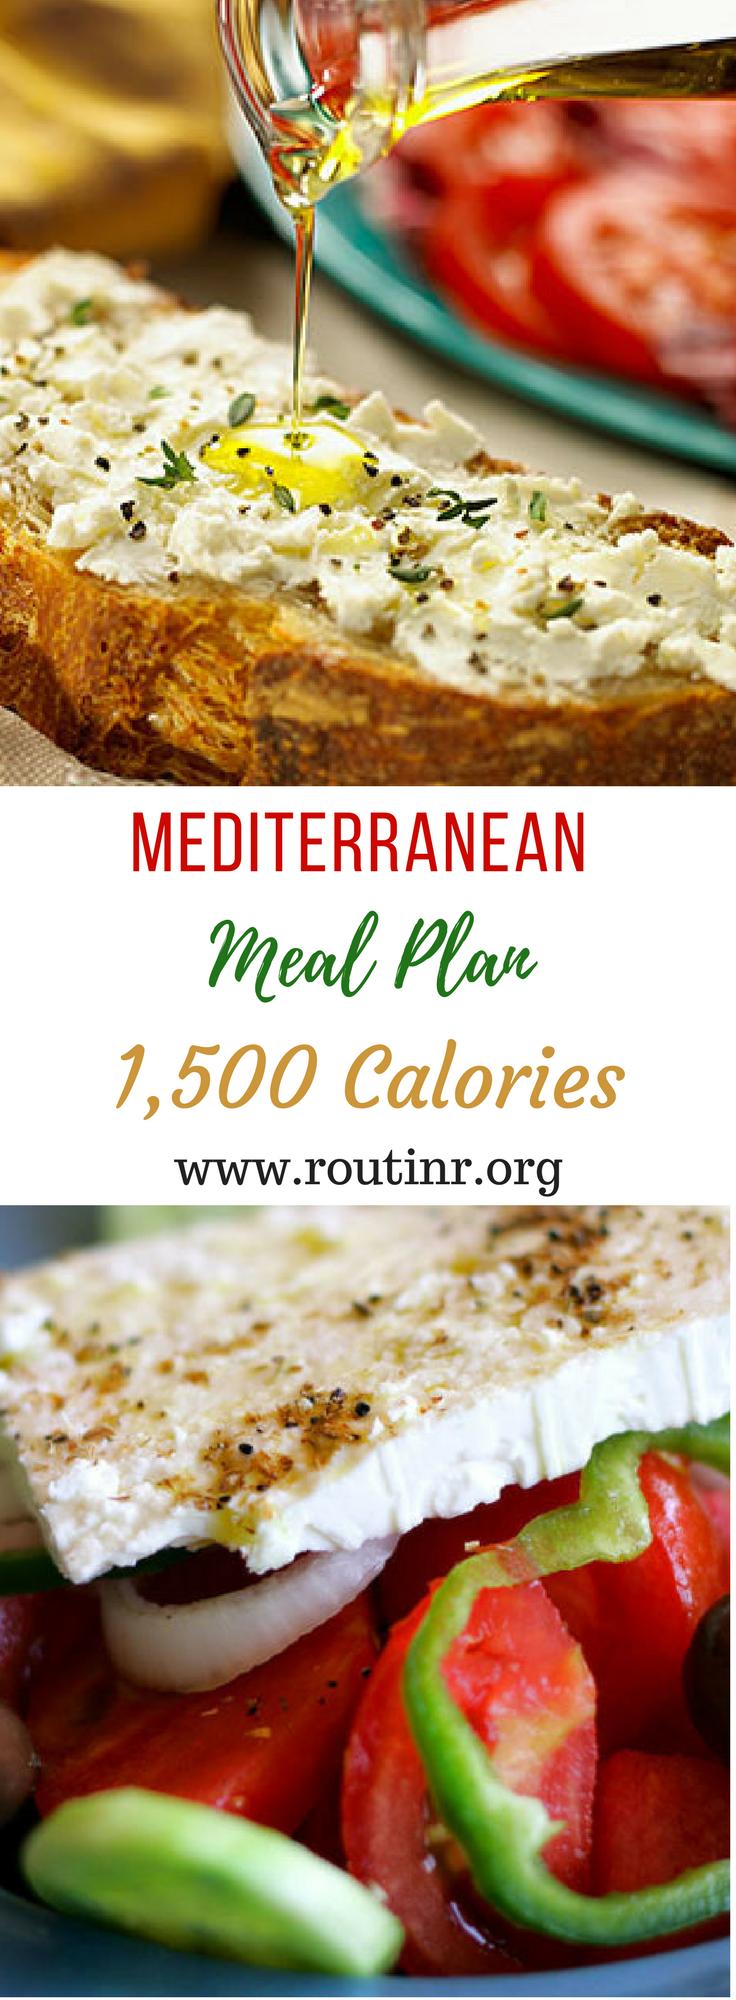 5+ Healthy Benefits of Following a Mediterranean Diet Plan Ideas